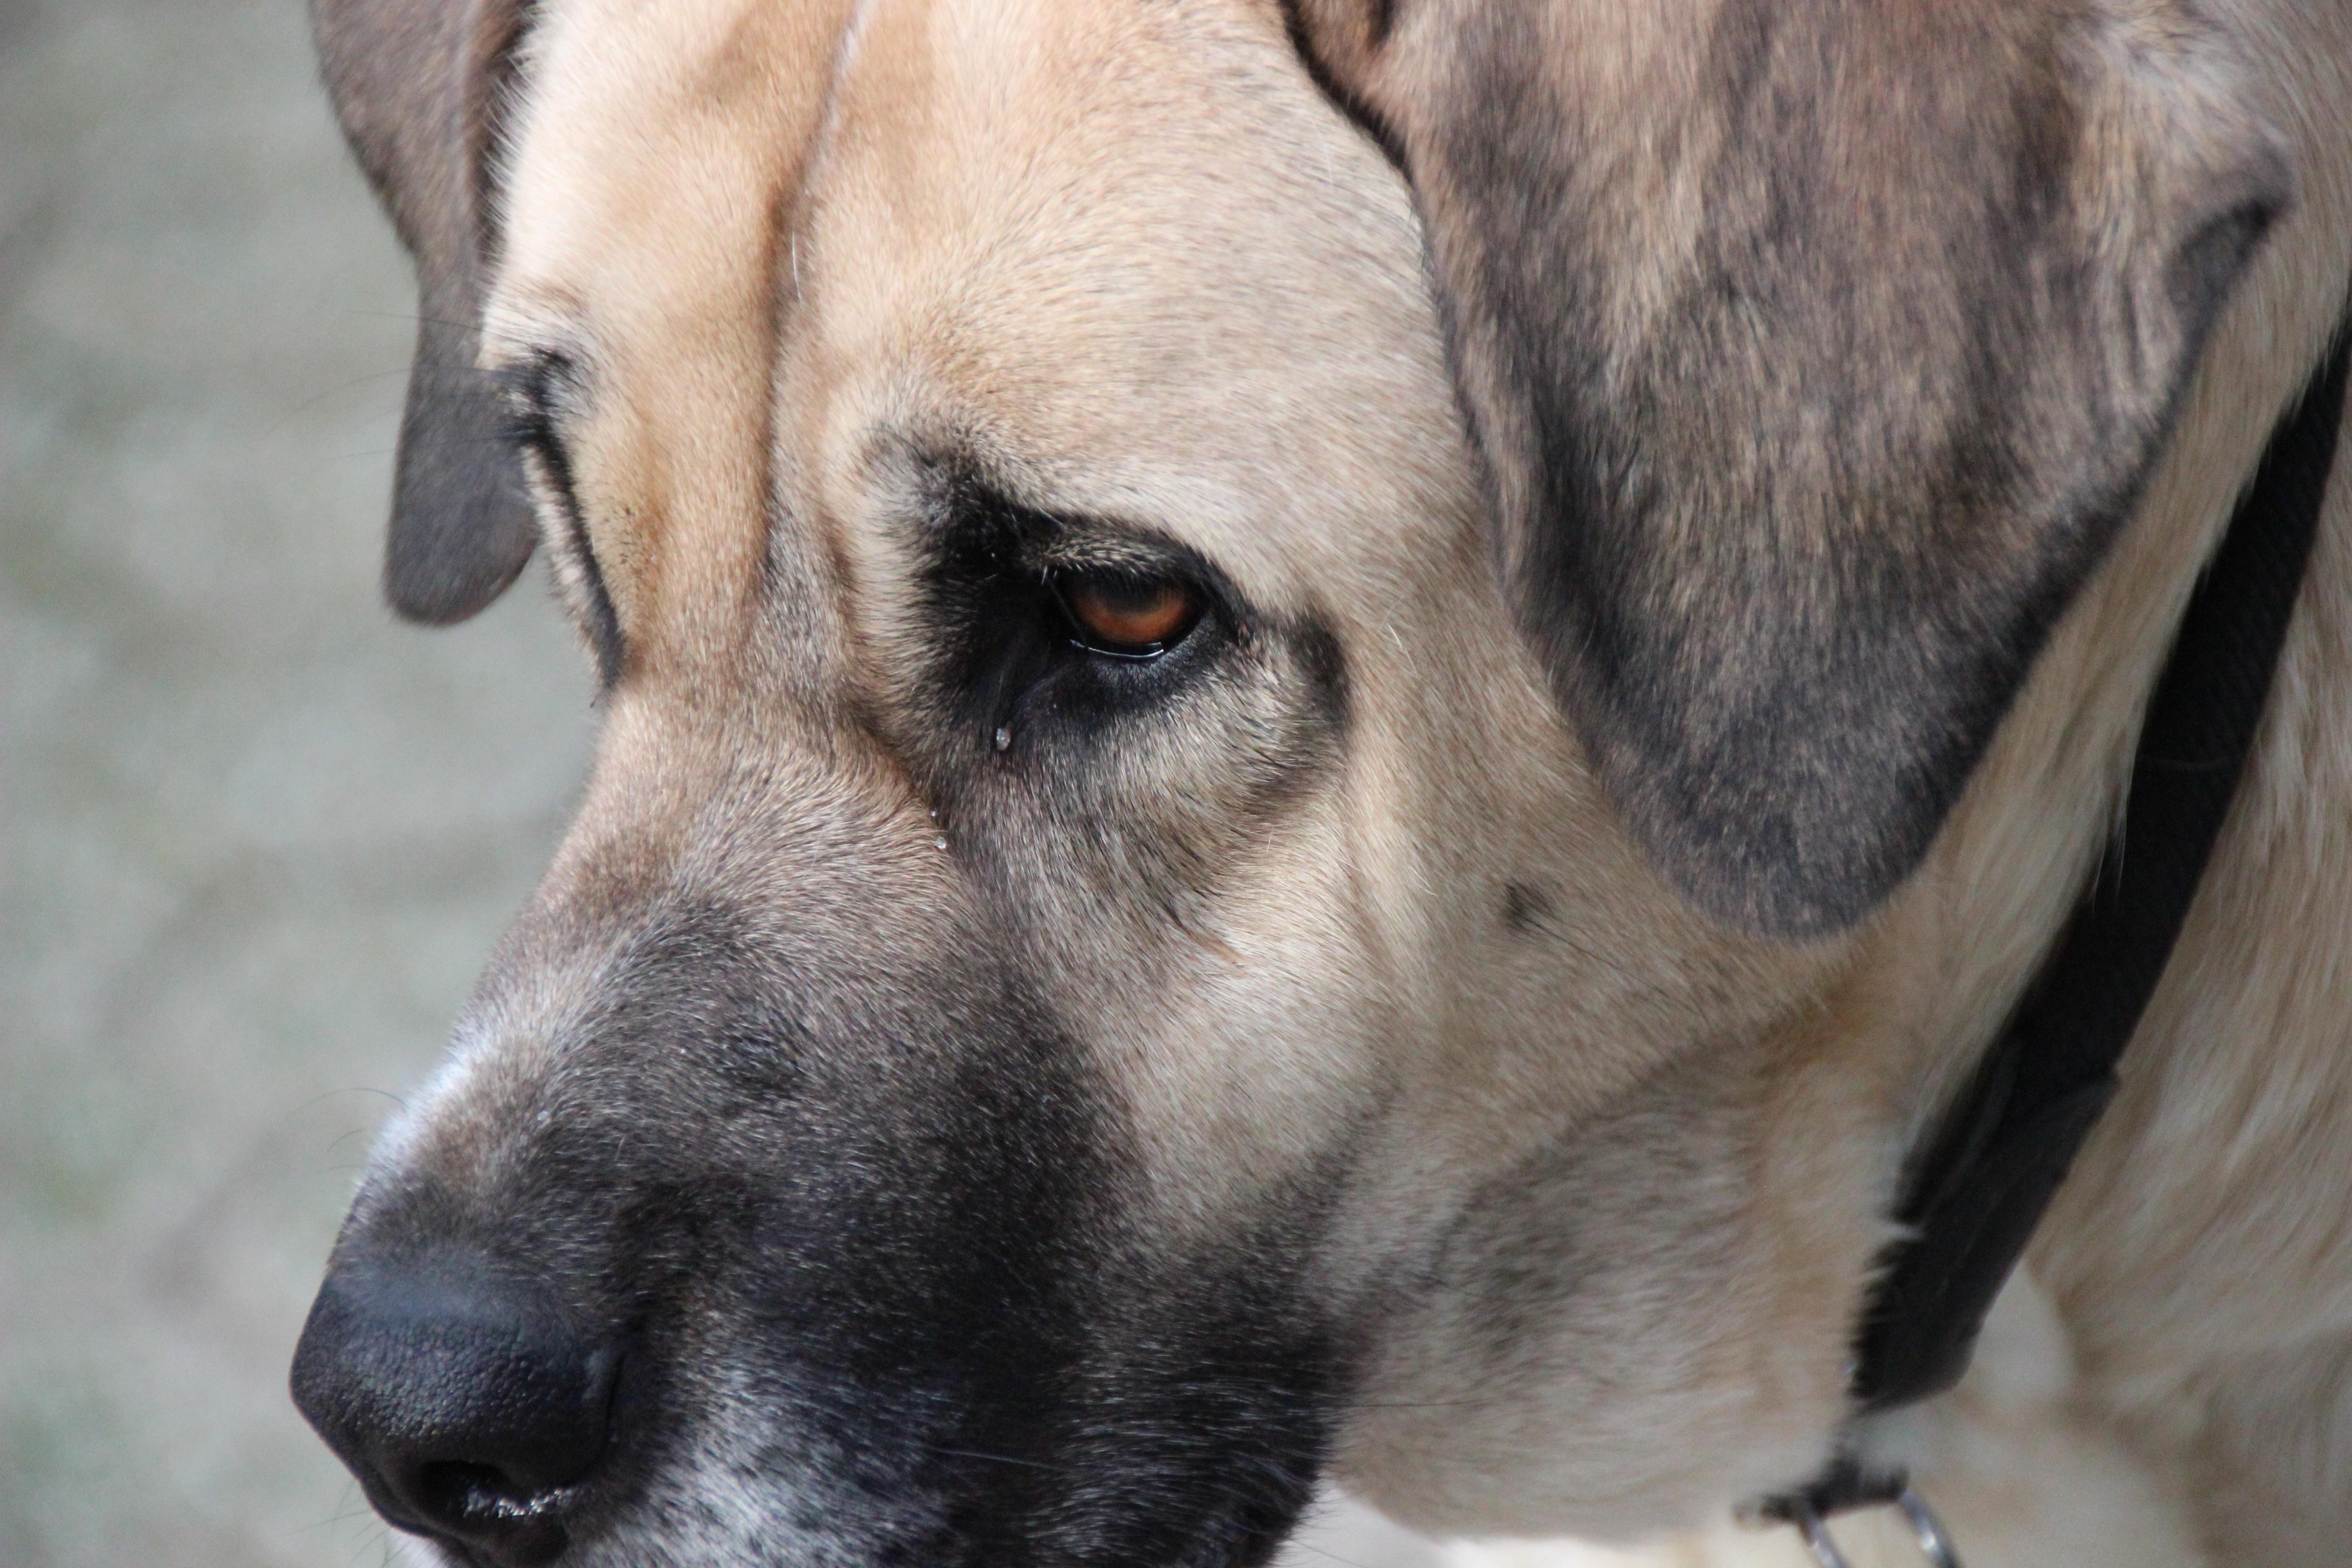 Must see Boerboel Black Adorable Dog - puppy-dog-fur-mammal-vertebrate-dog-breed-animal-portrait-herding-dog-guard-dog-dog-eye-bullmastiff-boerboel-street-dog-dog-like-mammal-carnivoran-dog-crossbreeds-black-mouth-cur-broholmer-mastin-mastino-dog-head-close-up-1290042  Collection_469285  .jpg